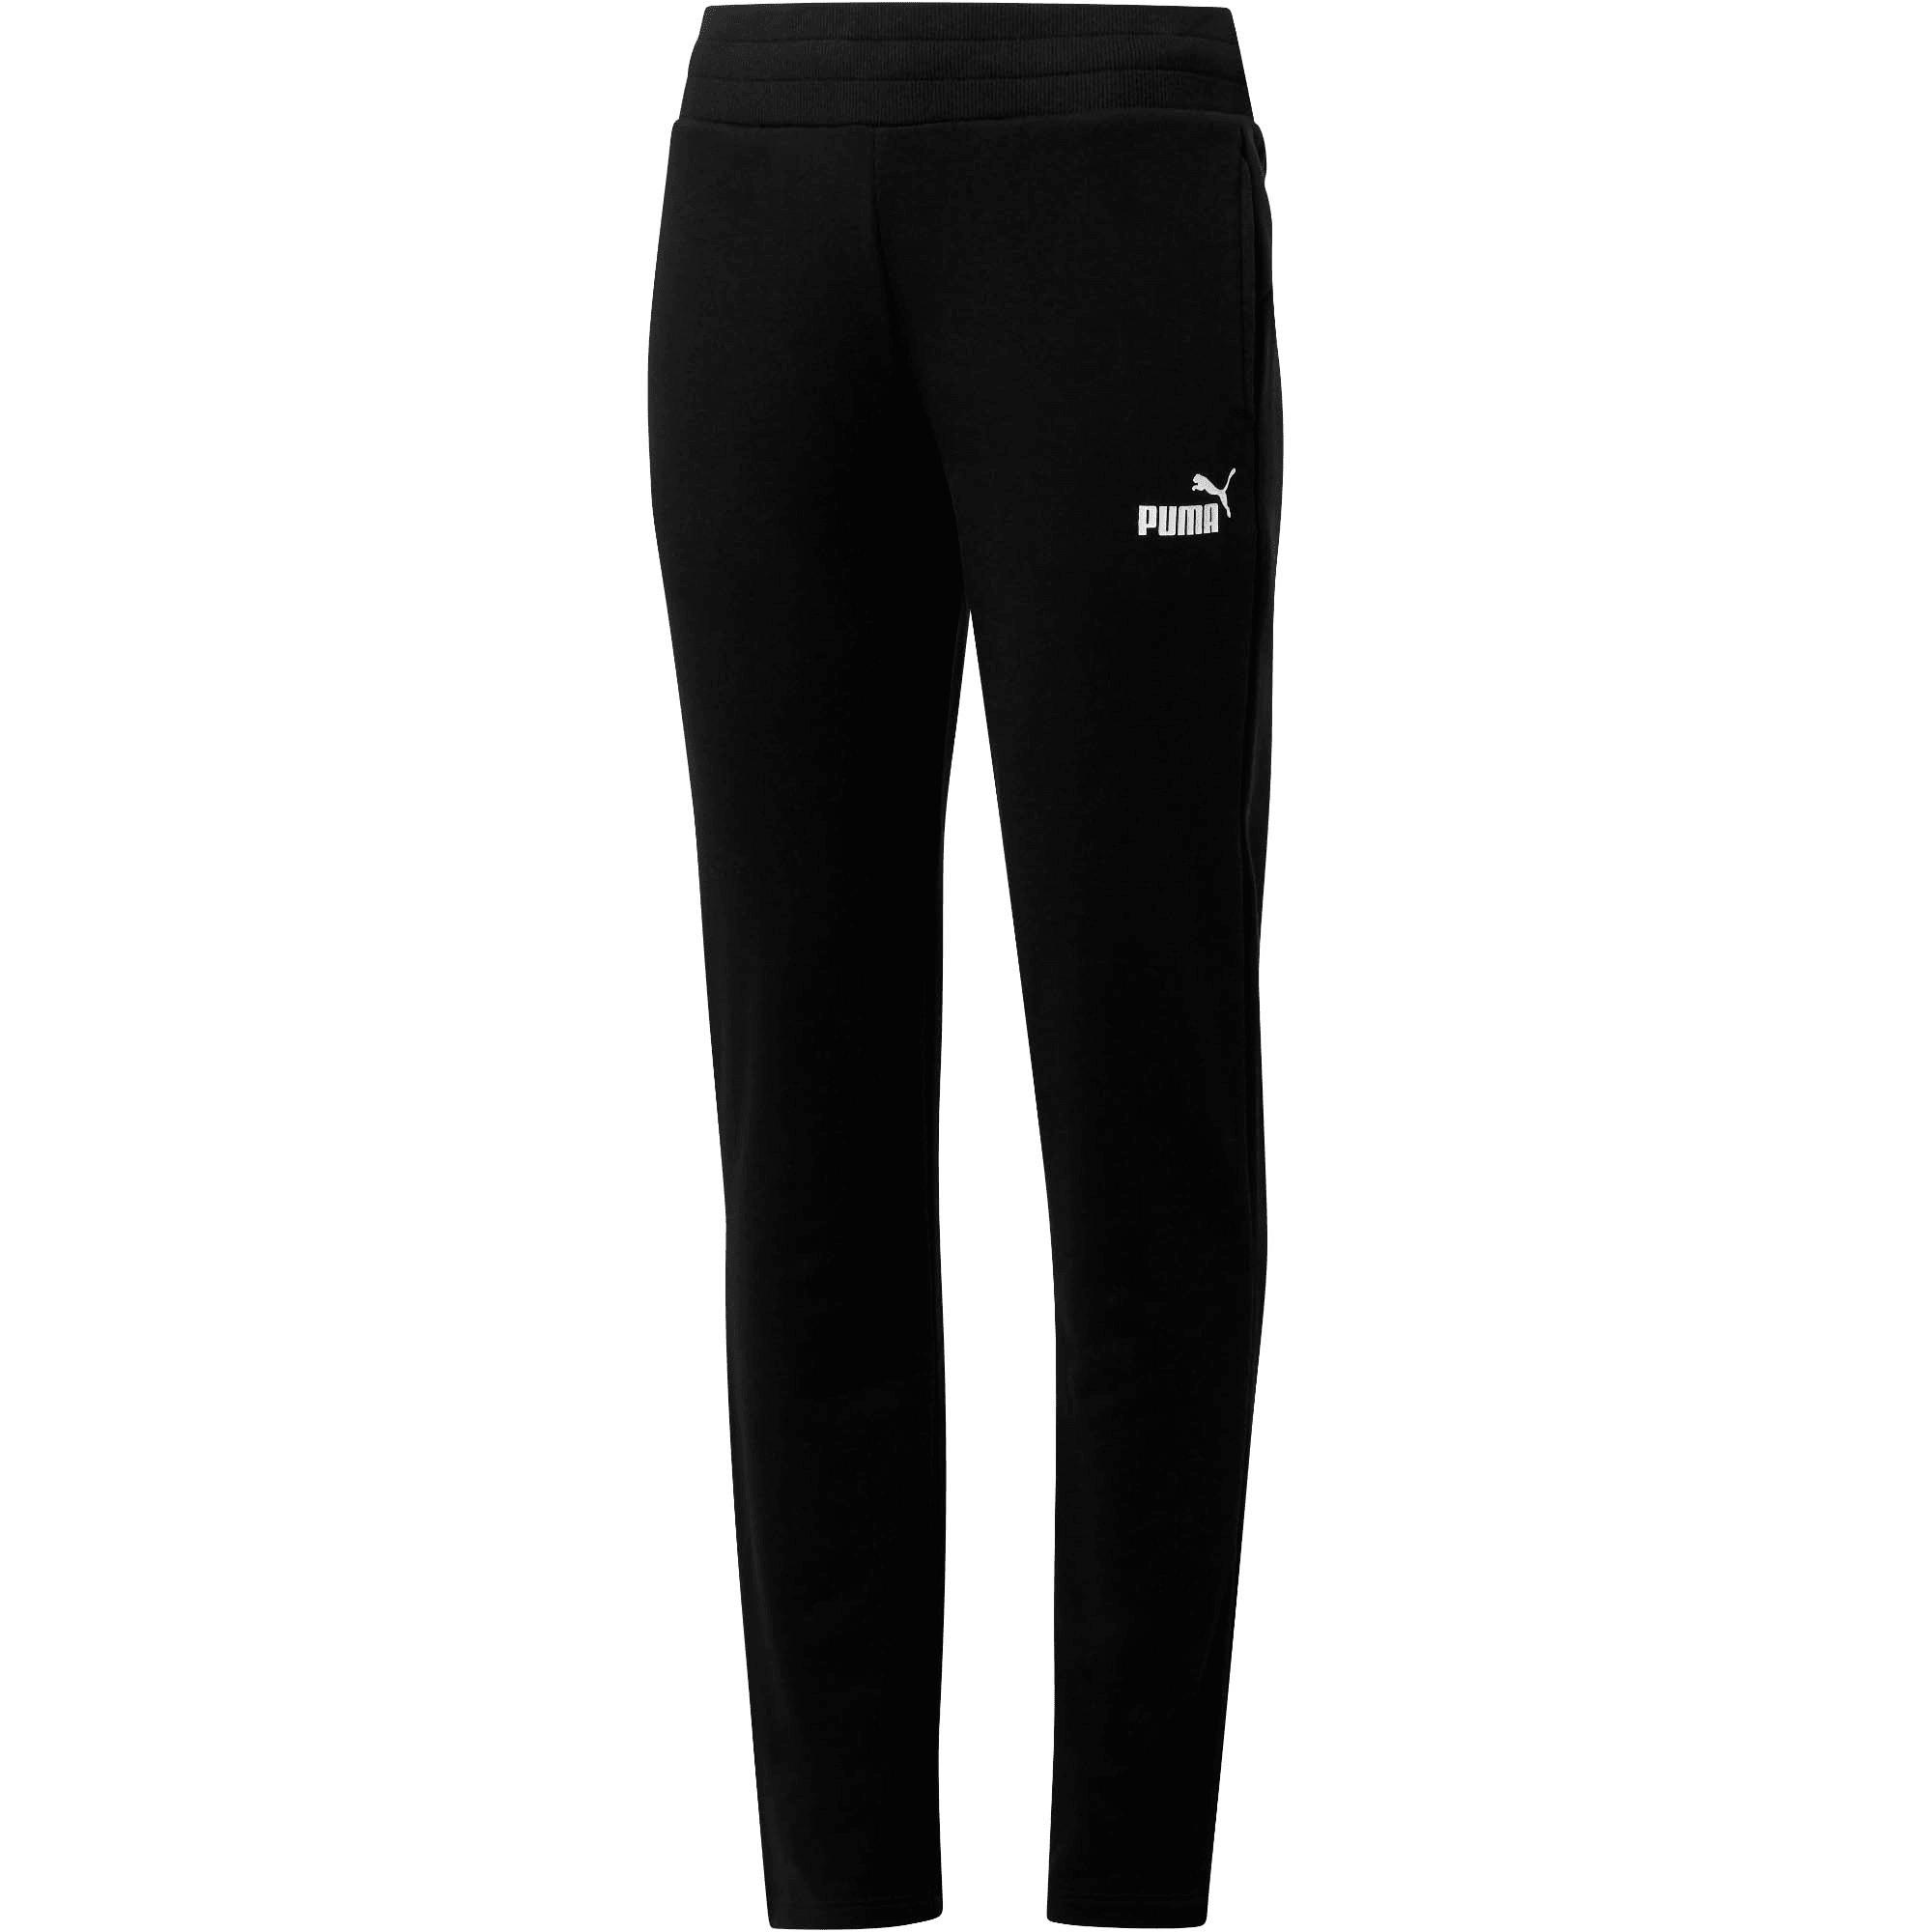 Thumbnail 1 of Essentials Women's Sweatpants, Cotton Black, medium